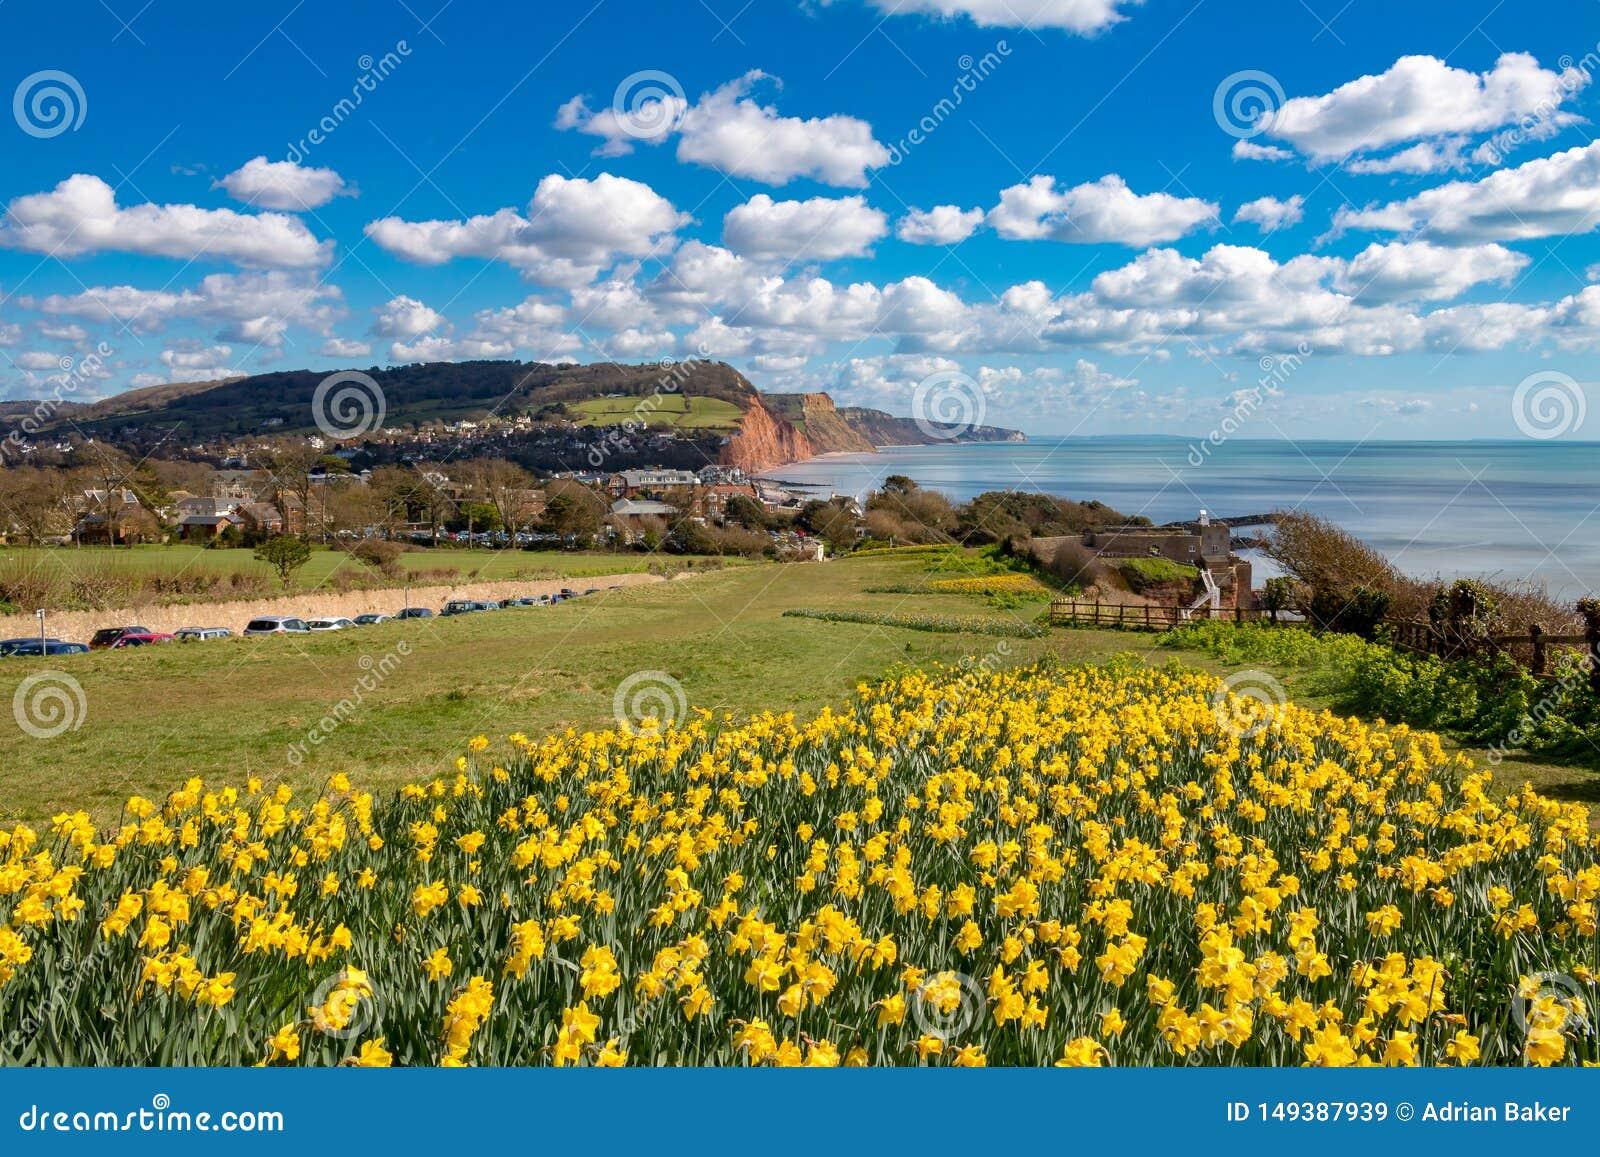 Sidmouth, Dorset, England